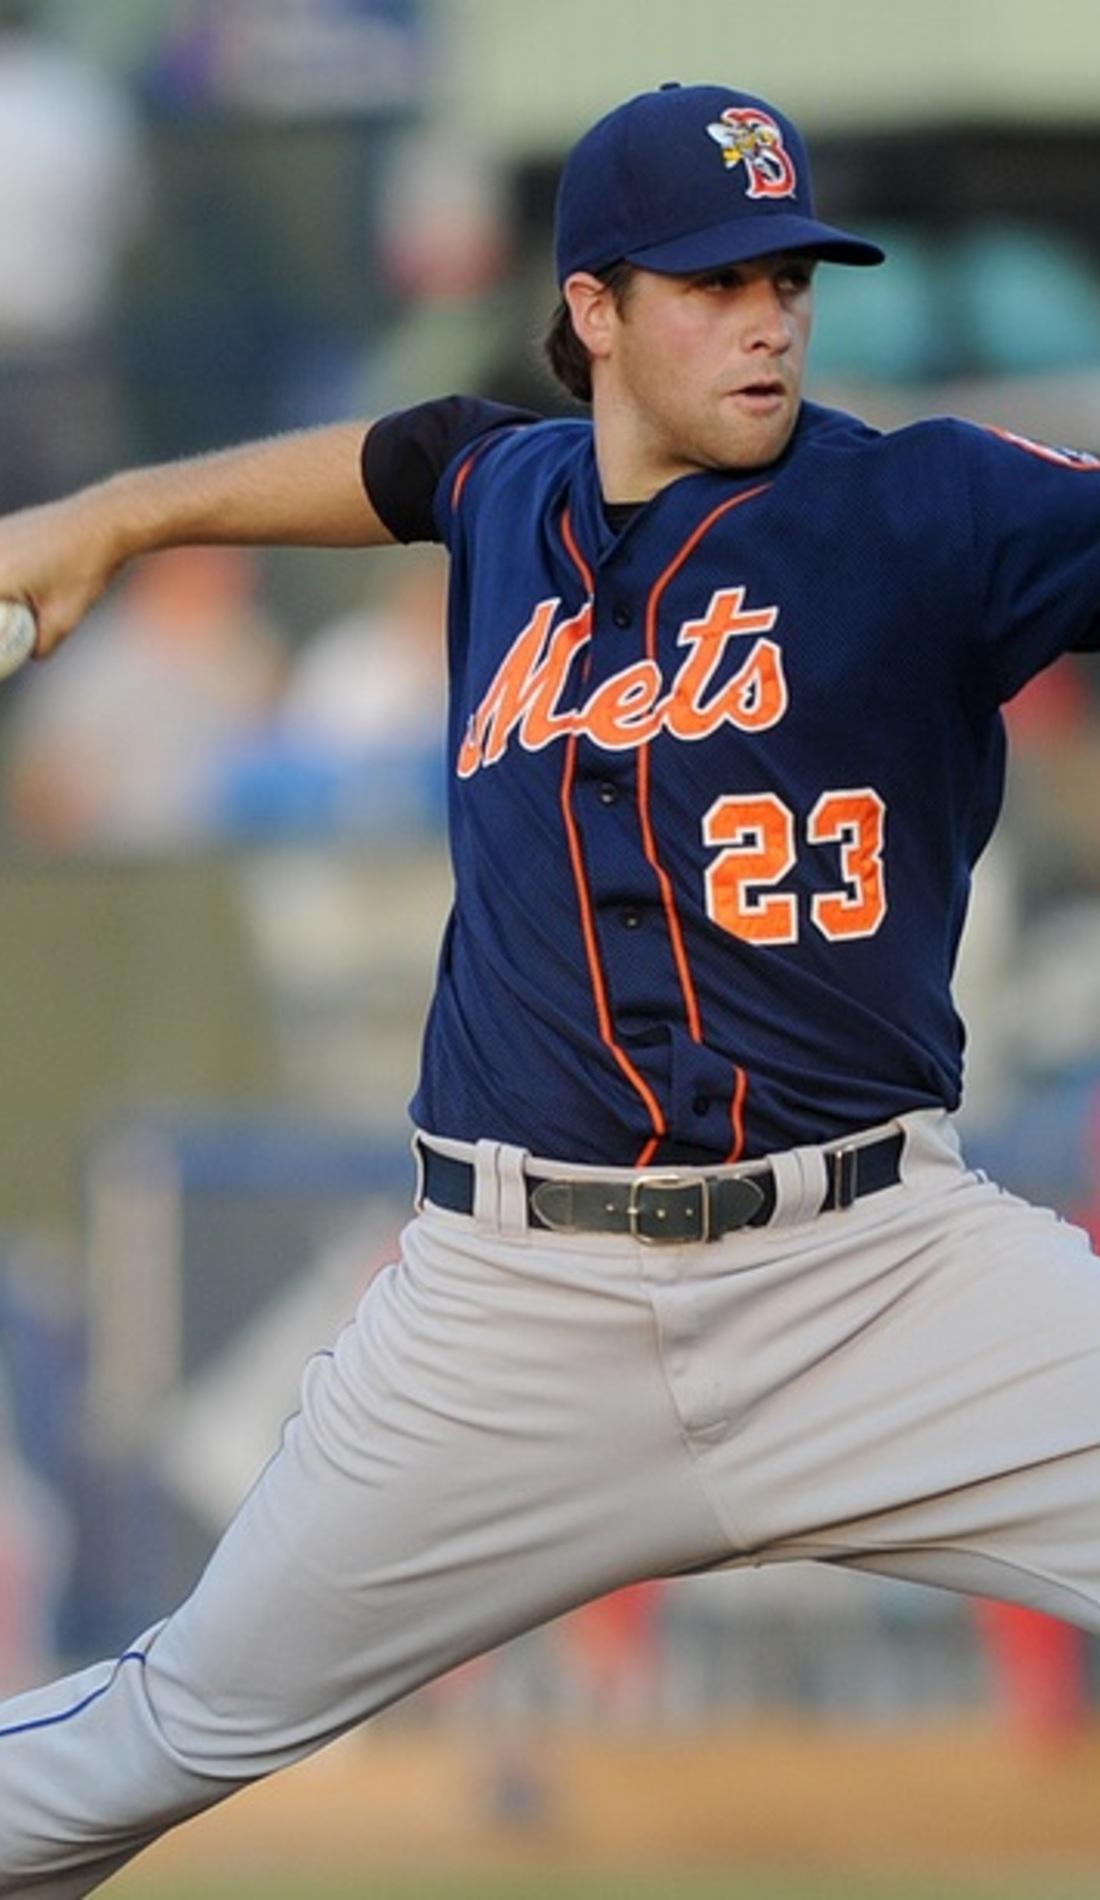 A Binghamton Mets live event